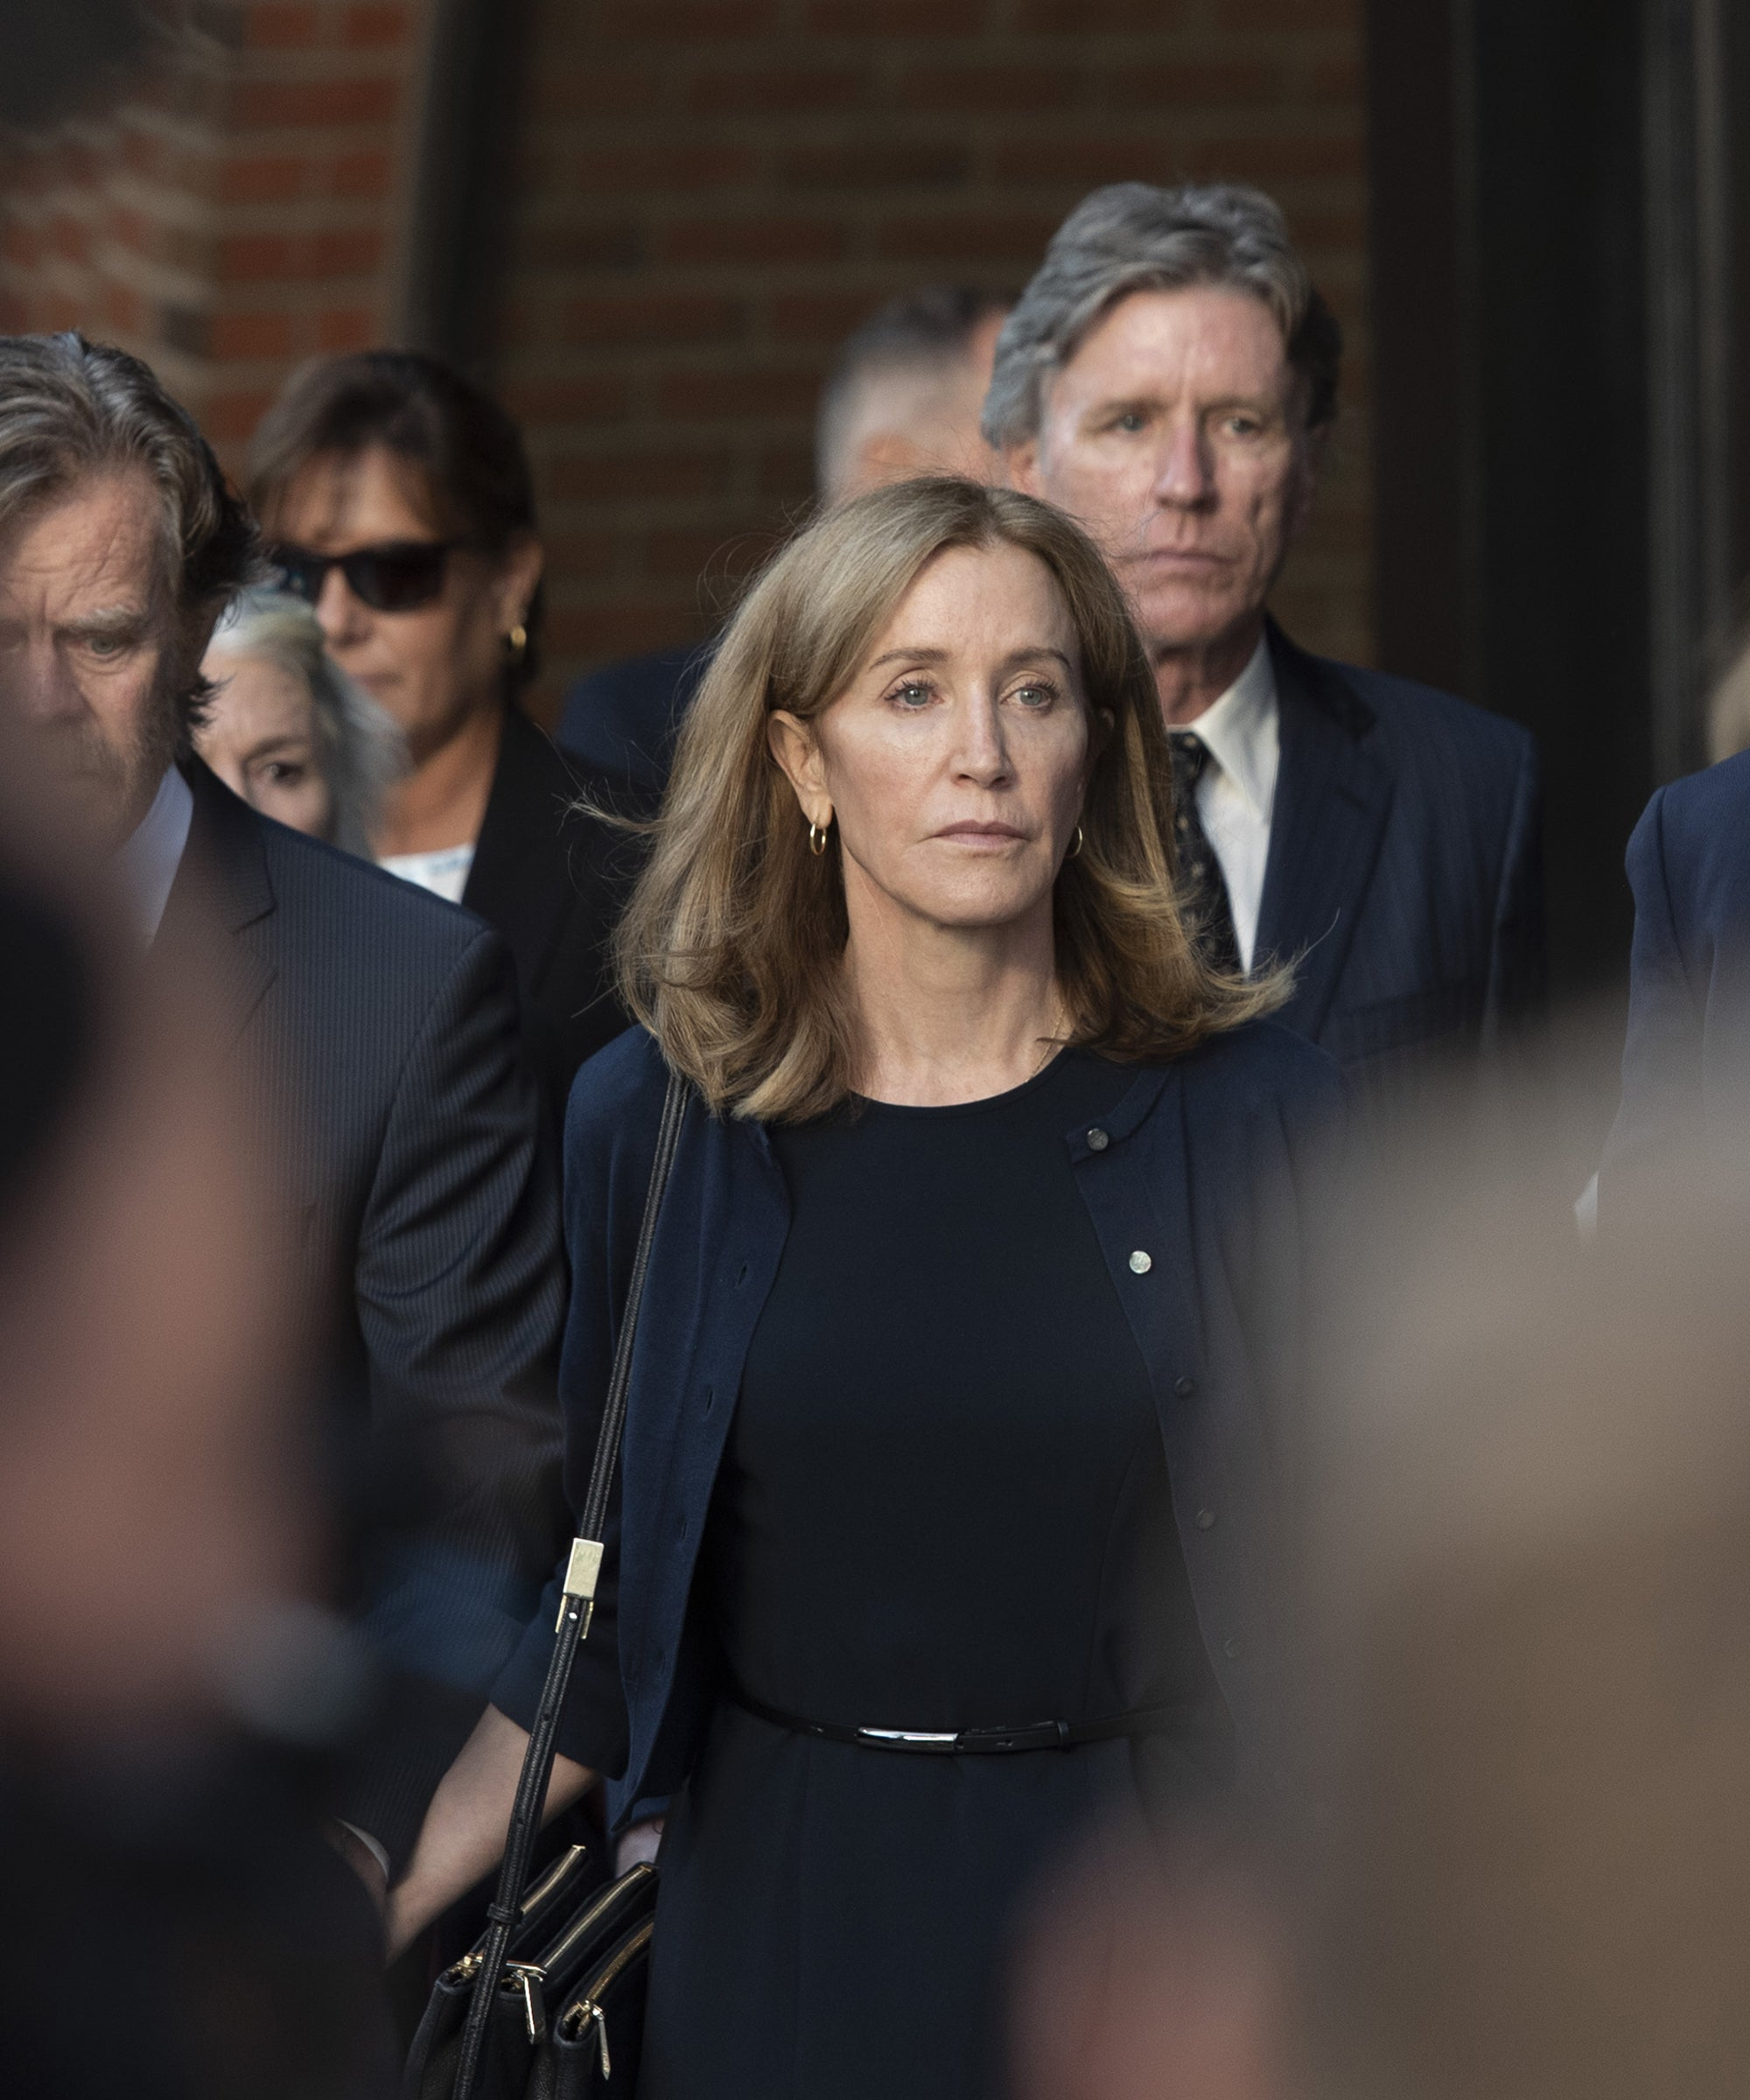 Felicity Huffman Just Started Her Prison Sentence